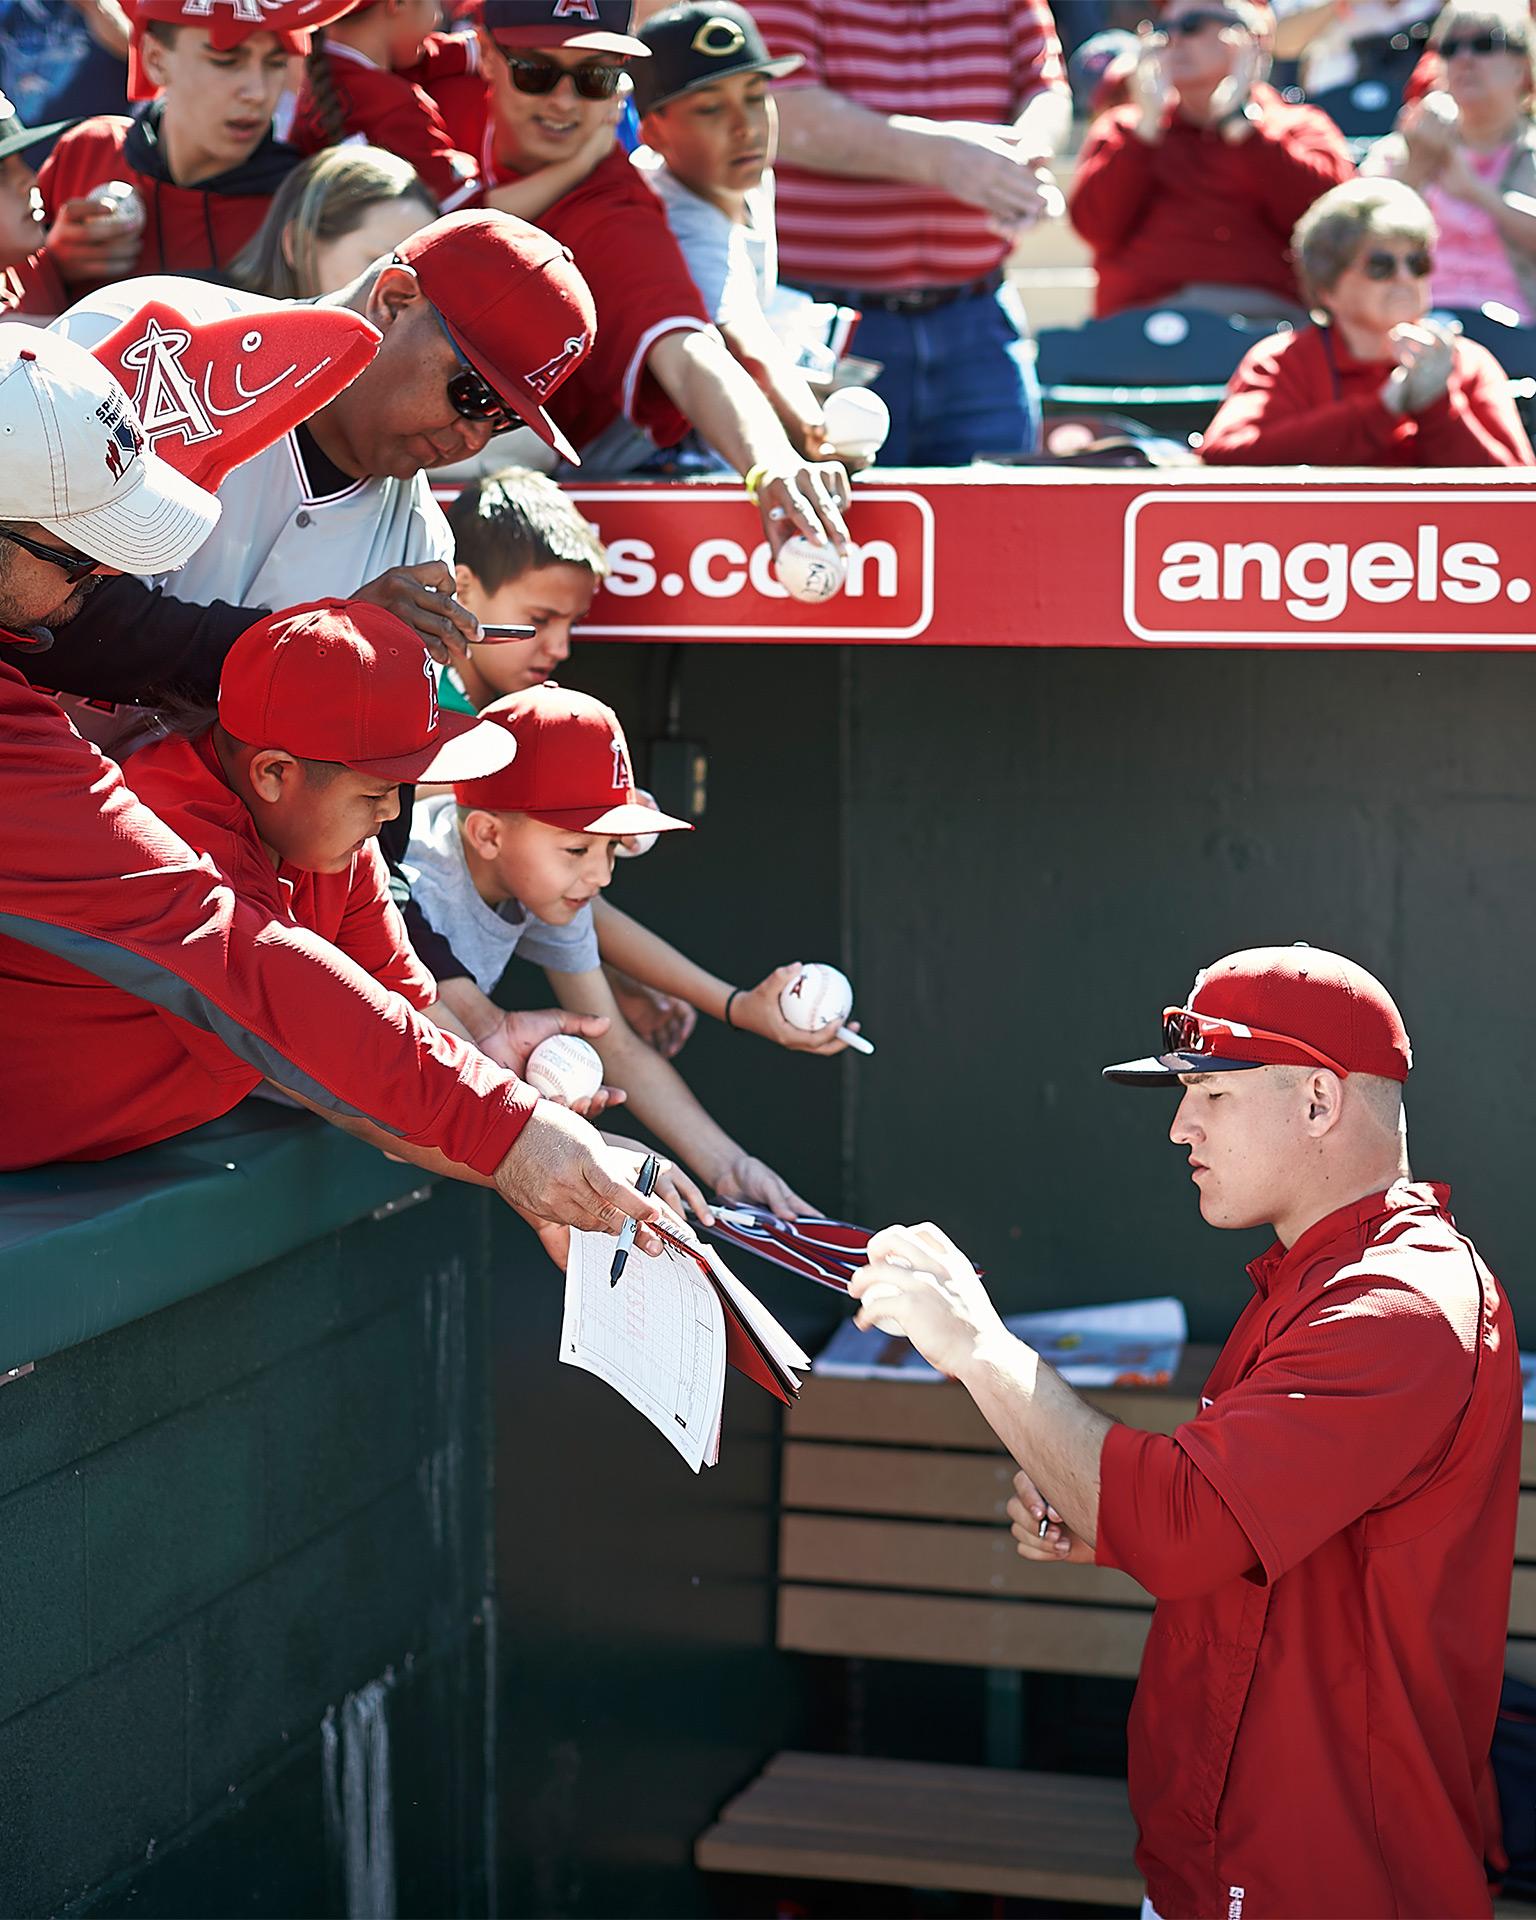 MLB News, Photos, Videos, Stats, Standings. - USA TODAY Angels baseball photo gallery